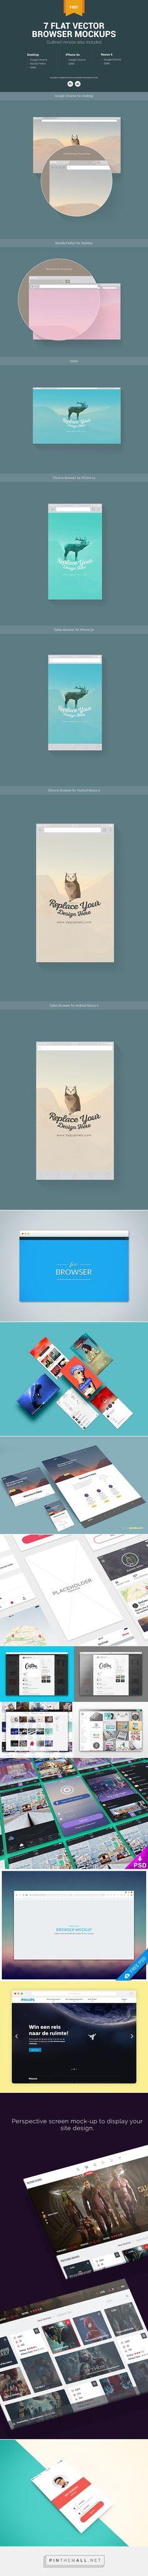 35+ Free Web Browser & App Presentation PSD Mockups - Fusionplate.com - created via https://pinthemall.net